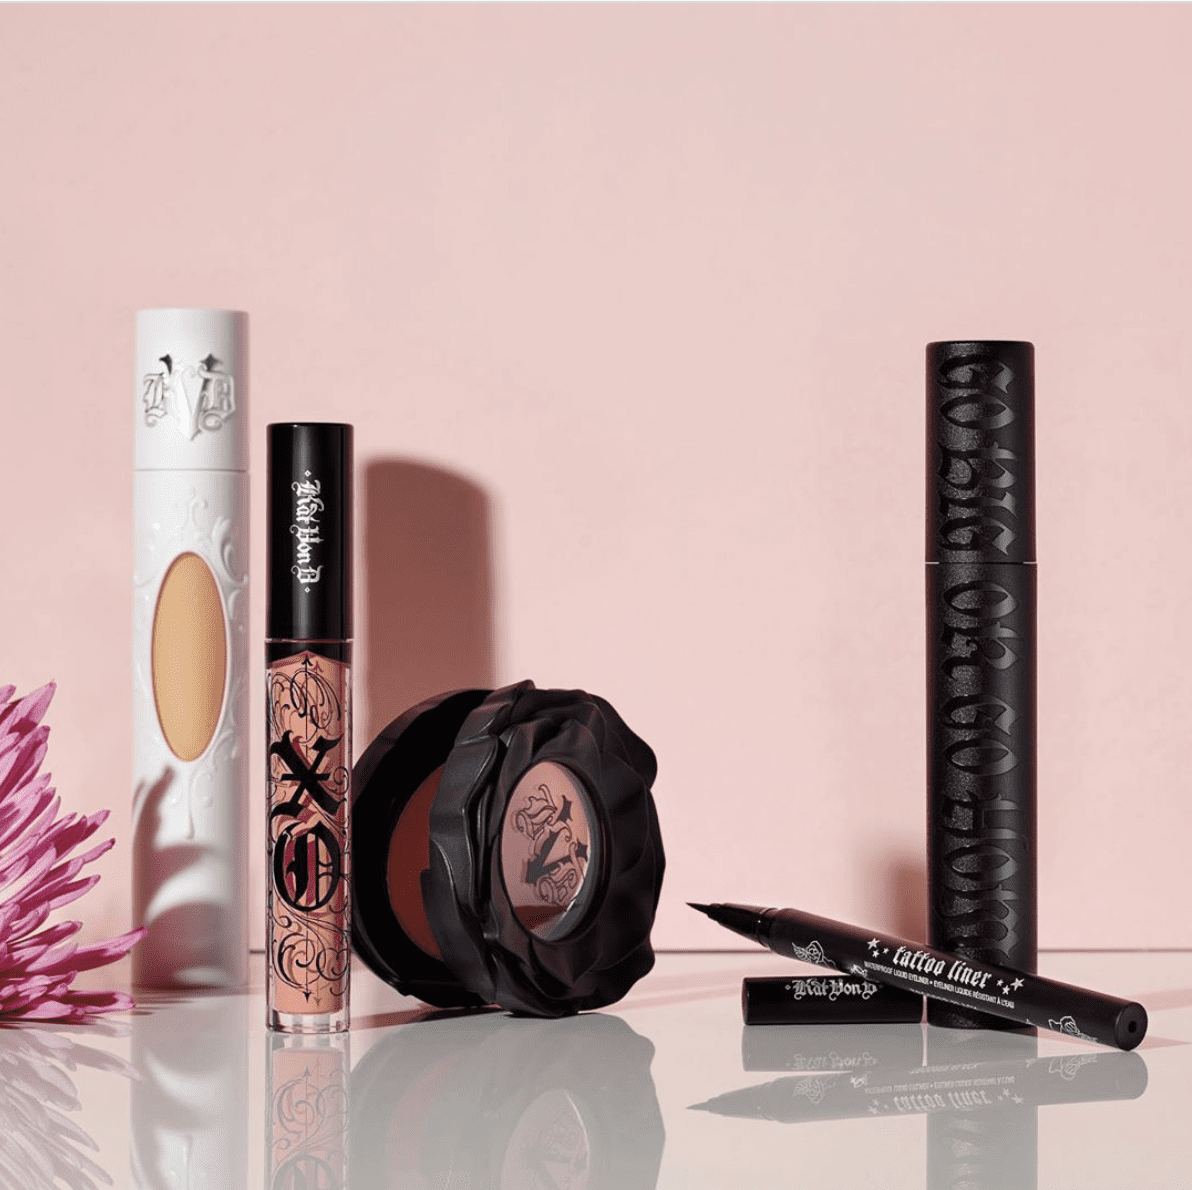 KVD Beauty: Extra 30% off sale items.